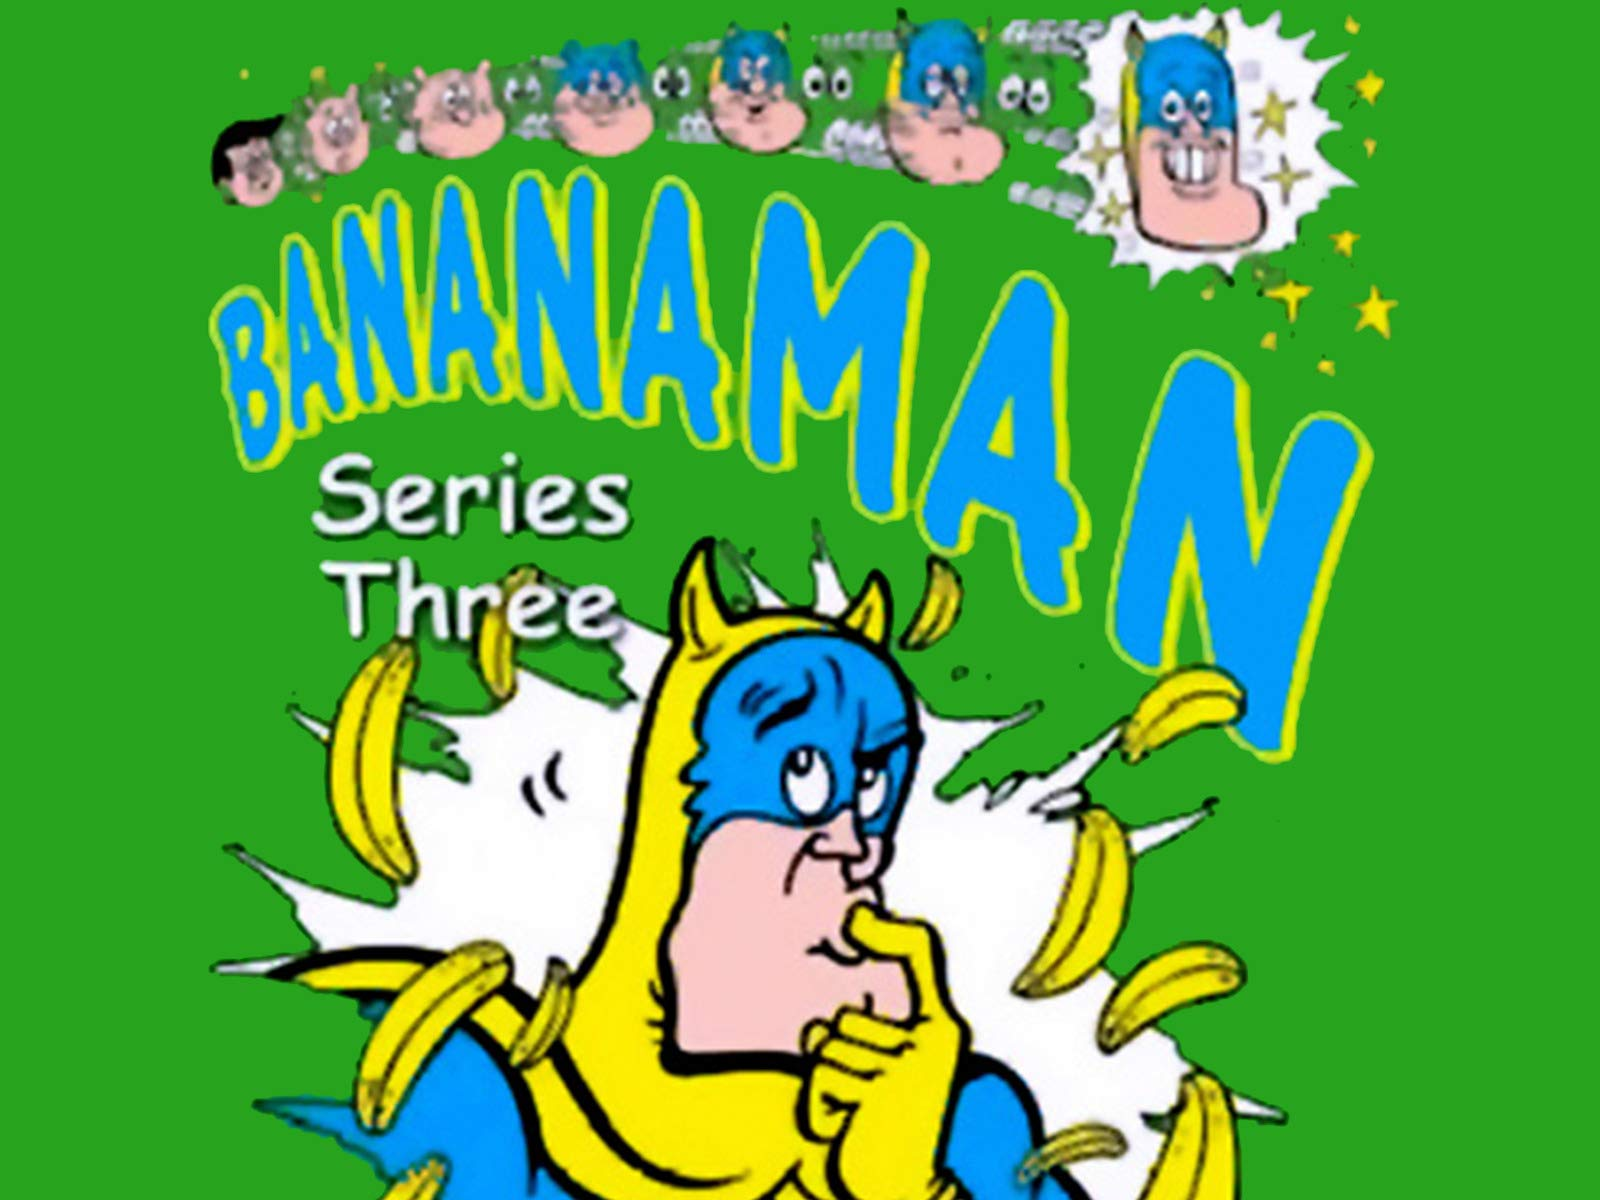 Bananaman - Season 3